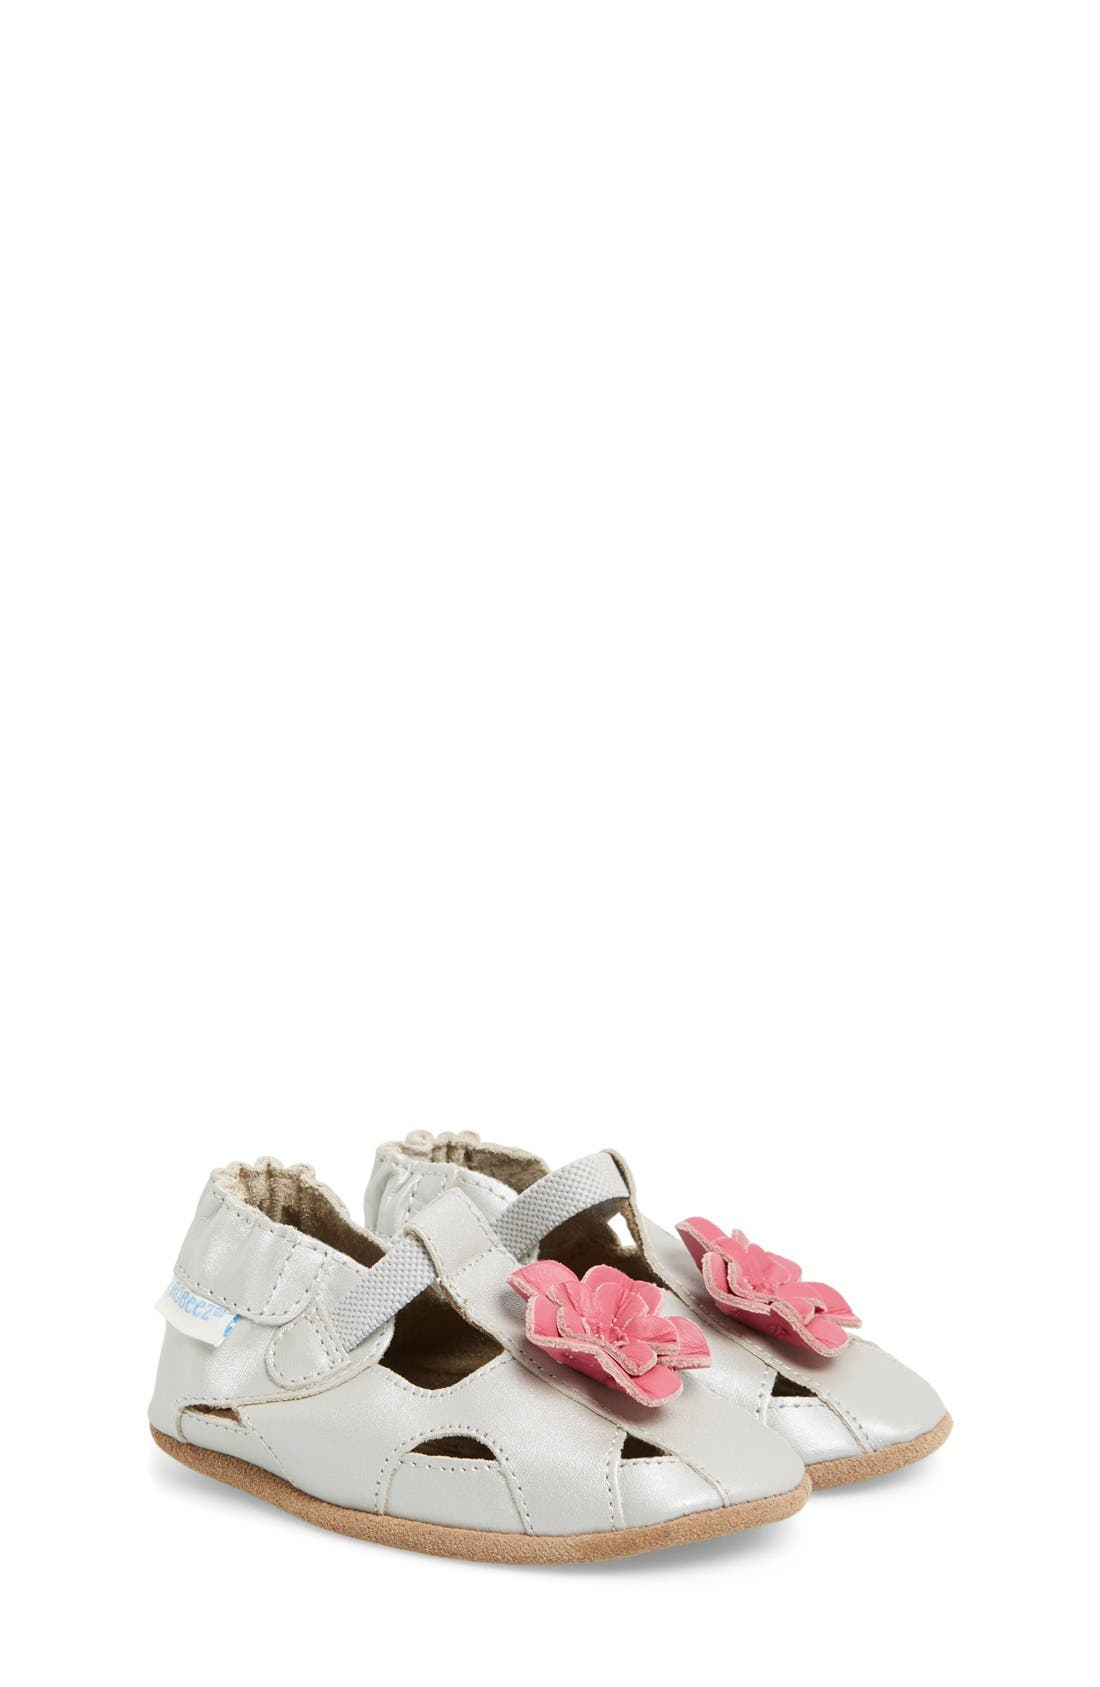 'Pretty Pansy' Sandal,                         Main,                         color, 040